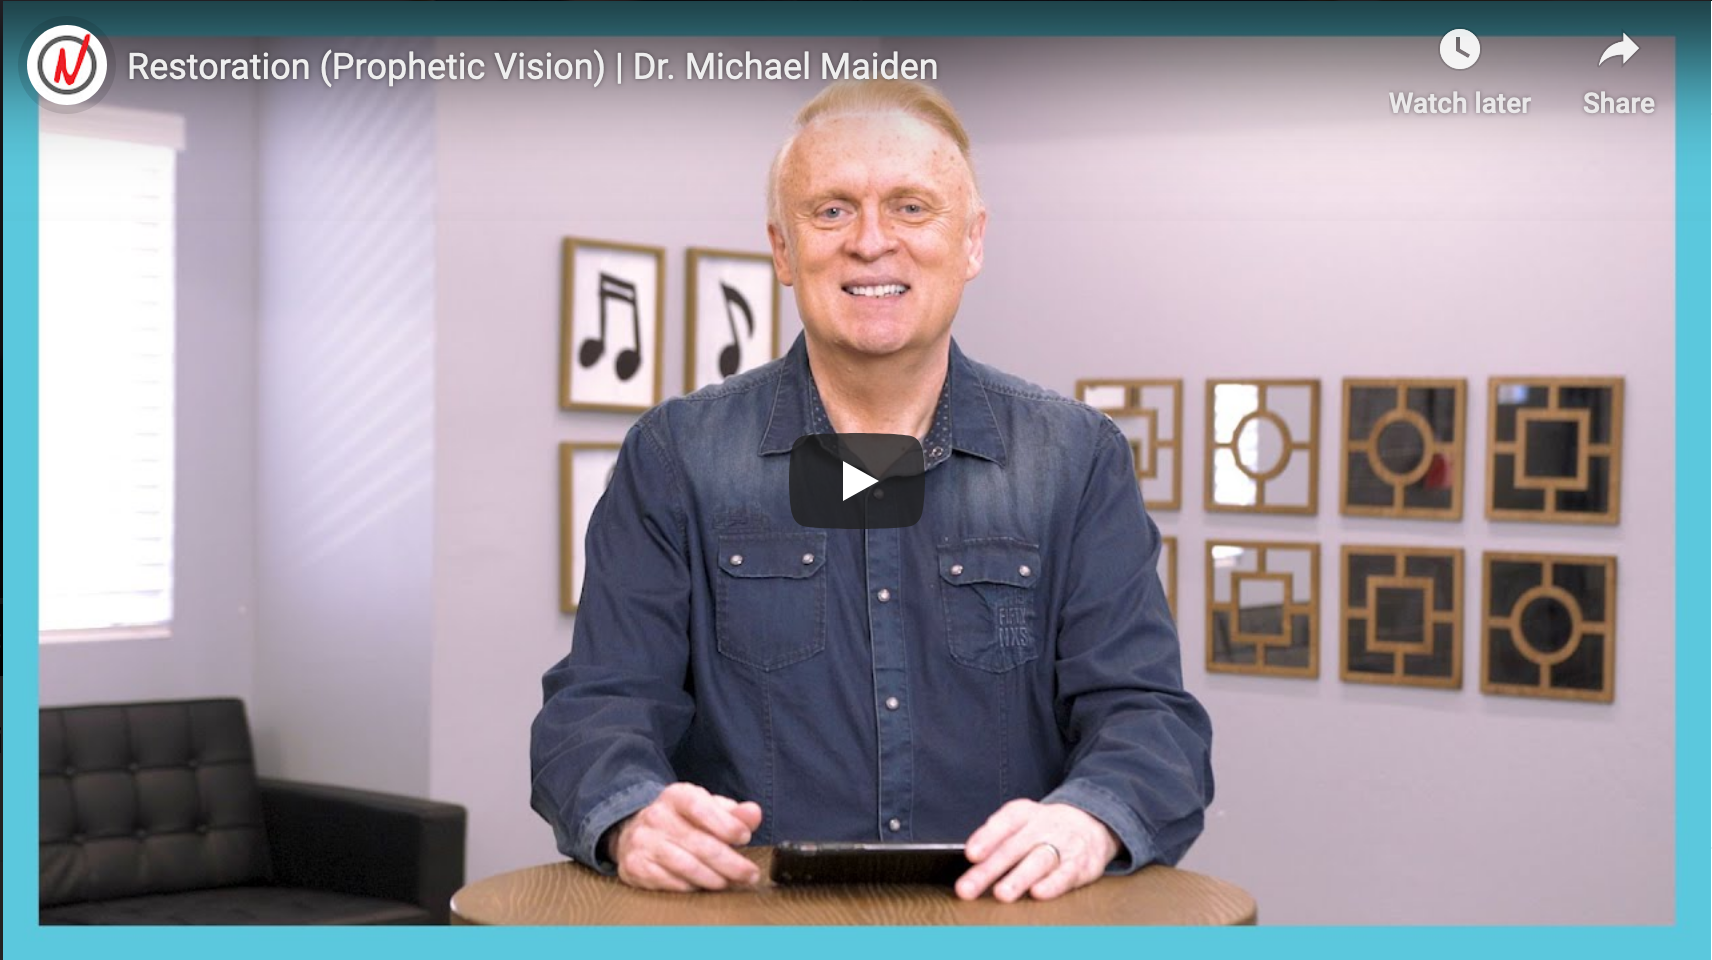 Prophetic Vision: Restoration